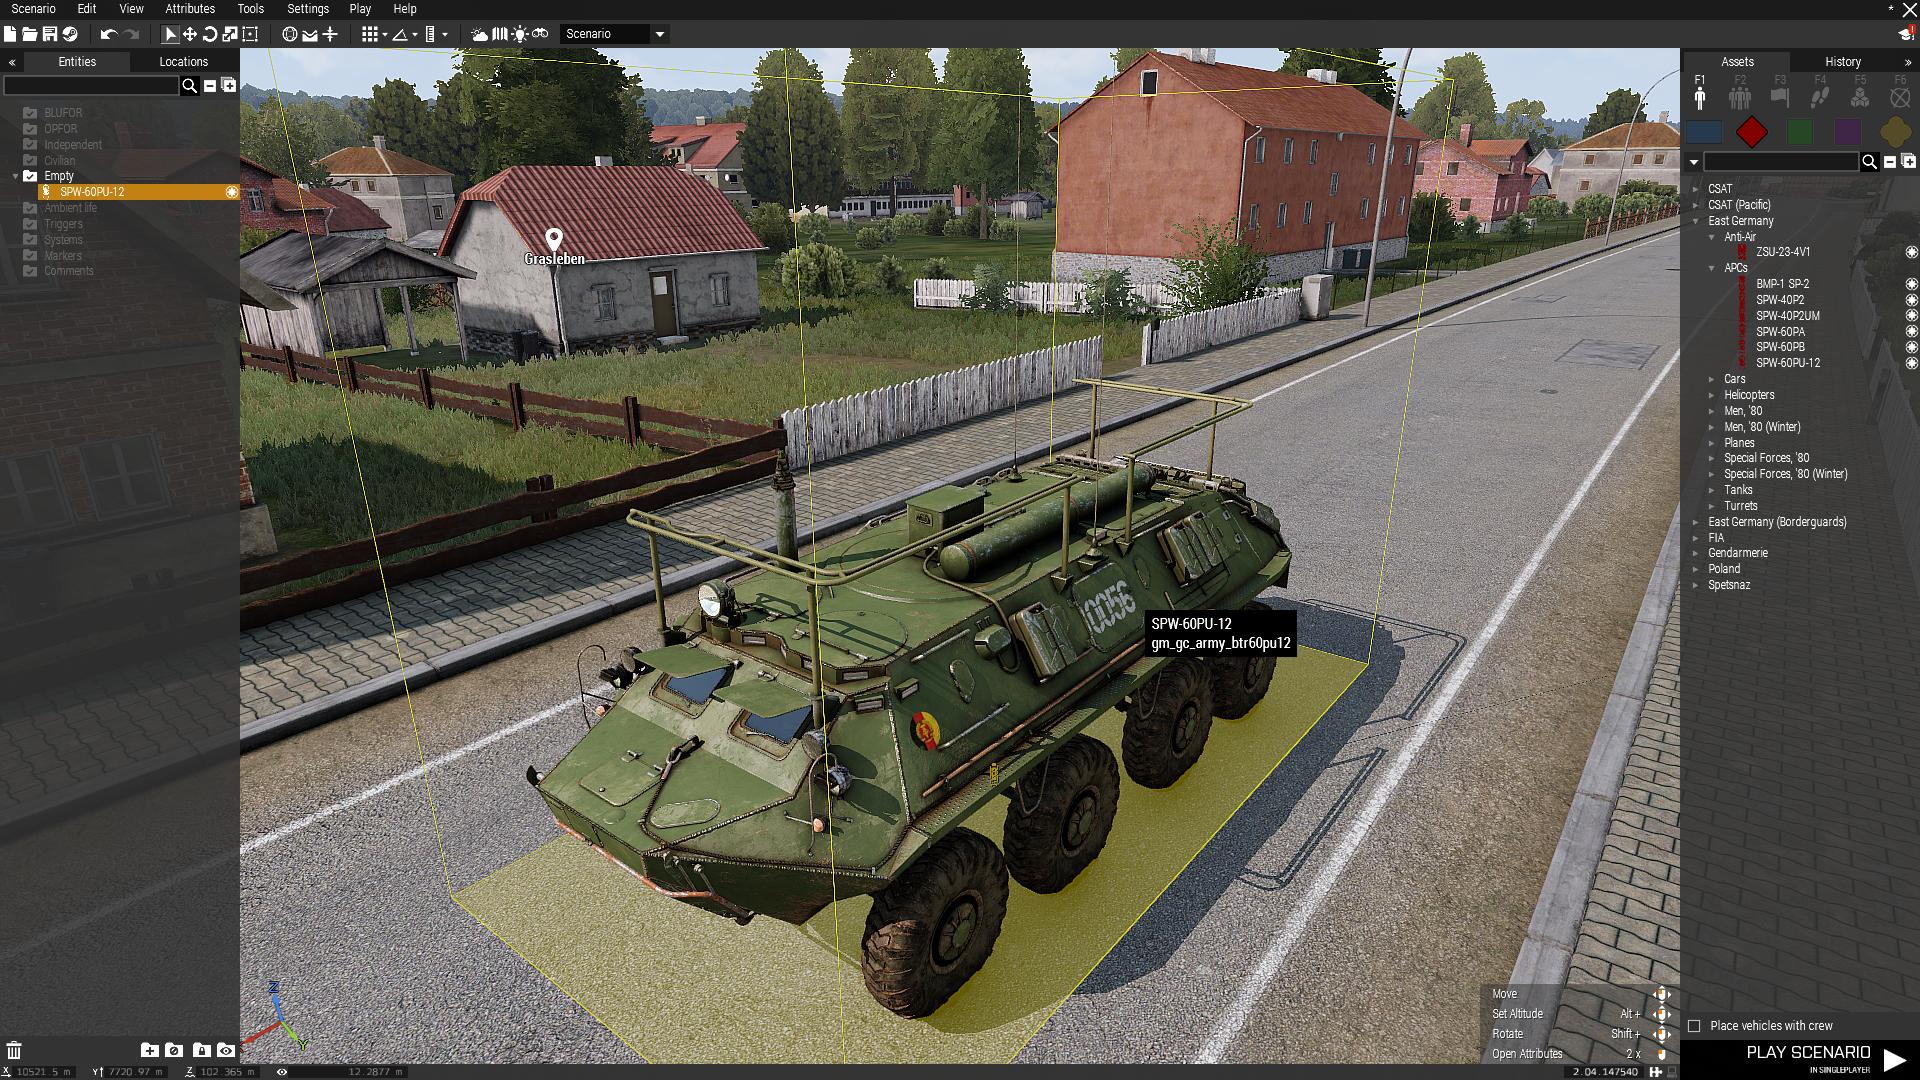 ArmA_3_Screenshot_2021.png